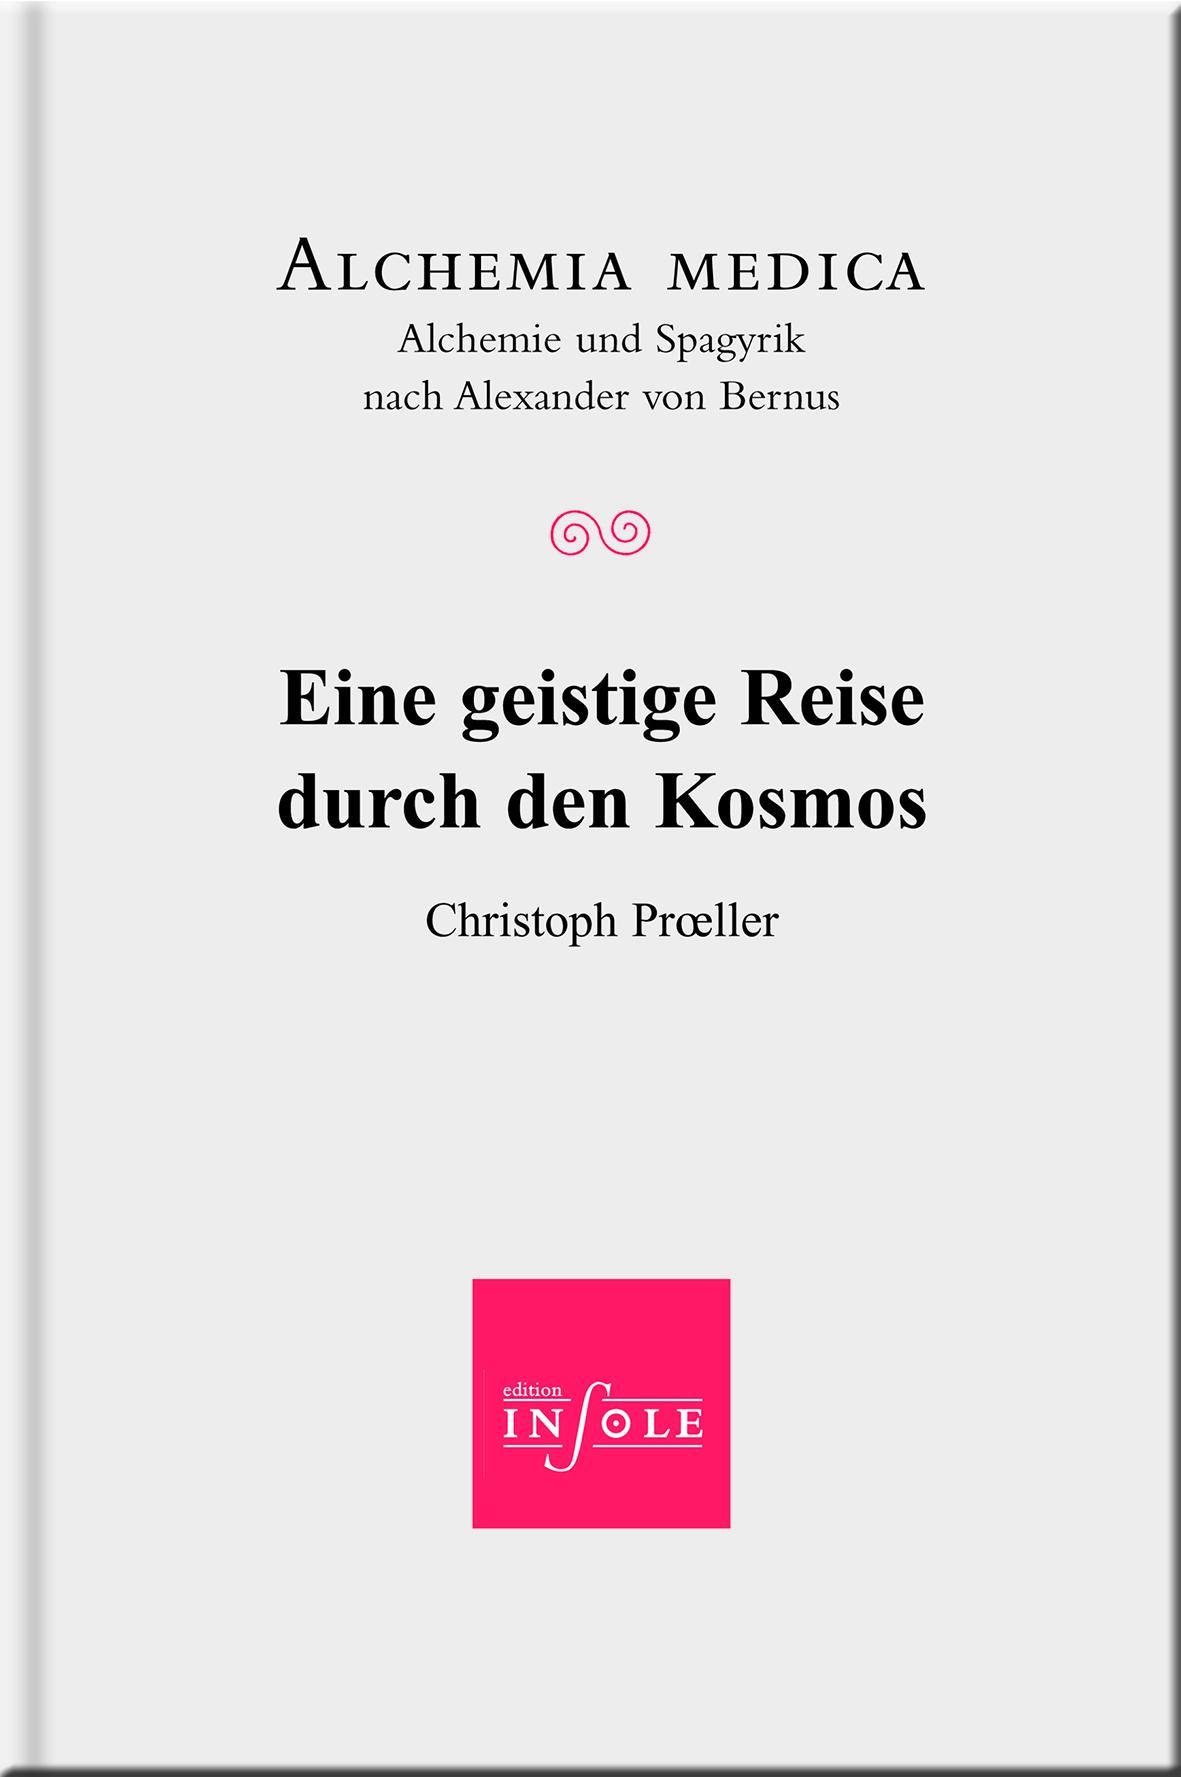 Philosophiebuch_Einband:Philosophiebuch_Einband.qxd.qxd